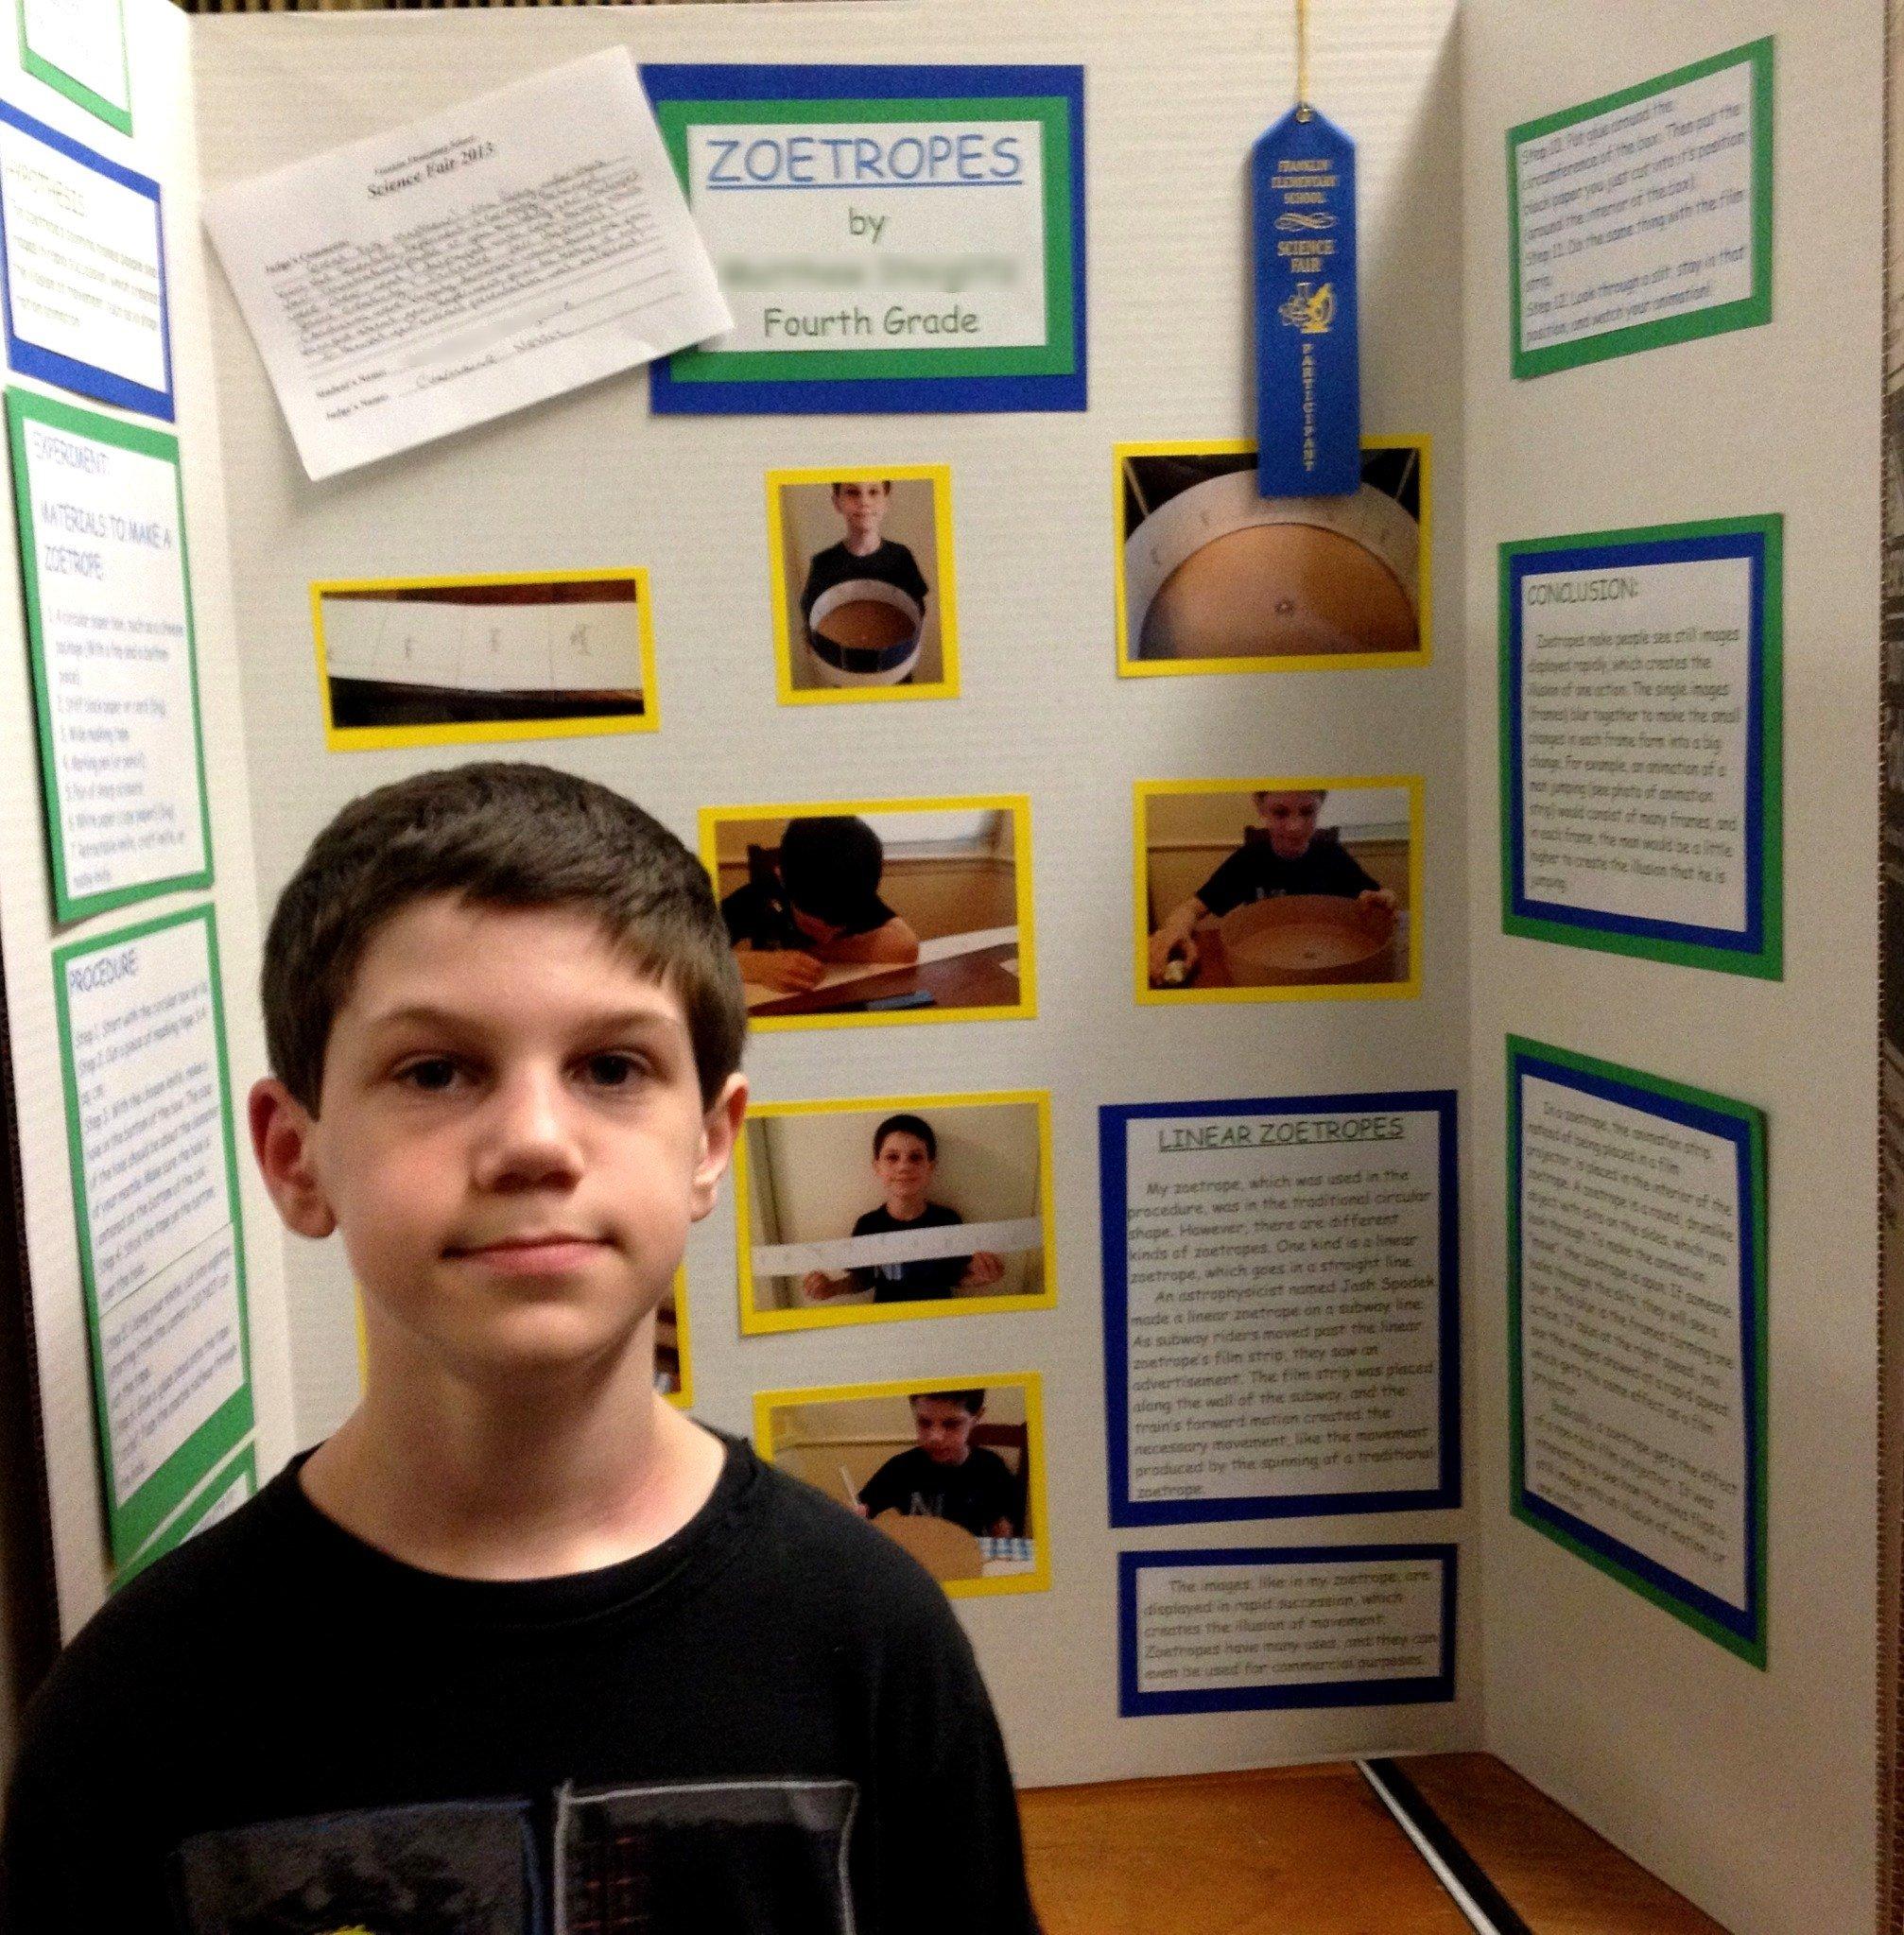 10 Attractive Fourth Grade Science Project Ideas zoetropes in a fourth grade science fair joshua spodek 3 2020